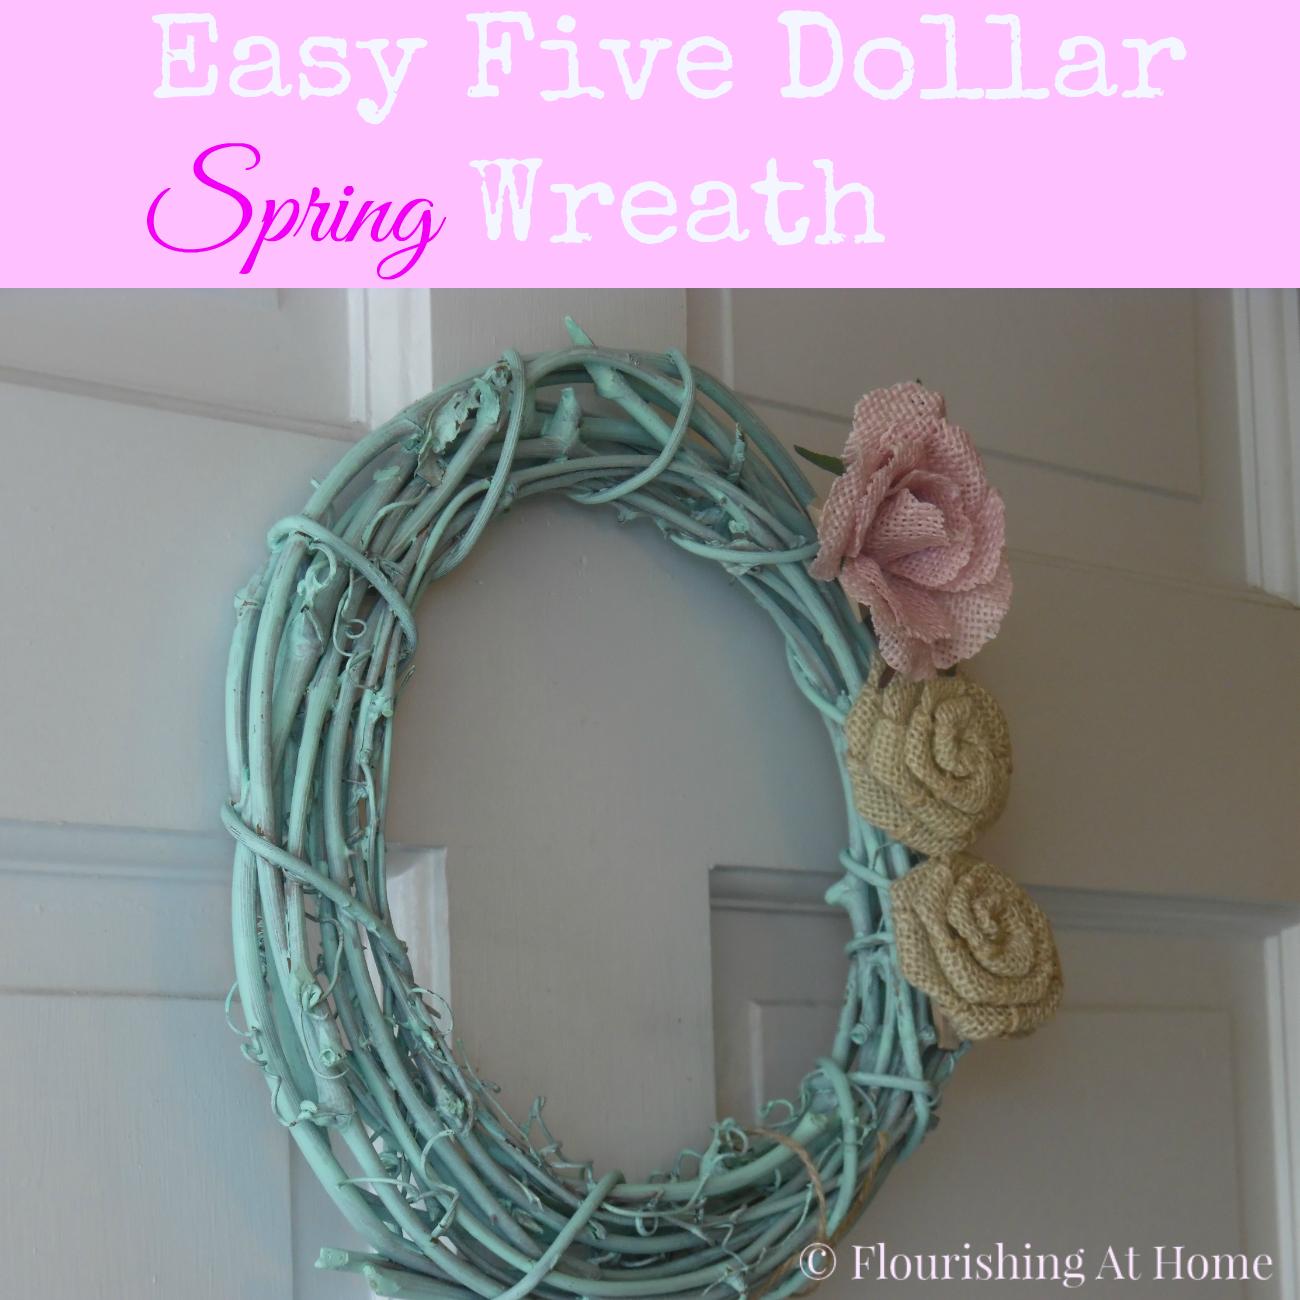 Easy Five Dollar Spring Wreath